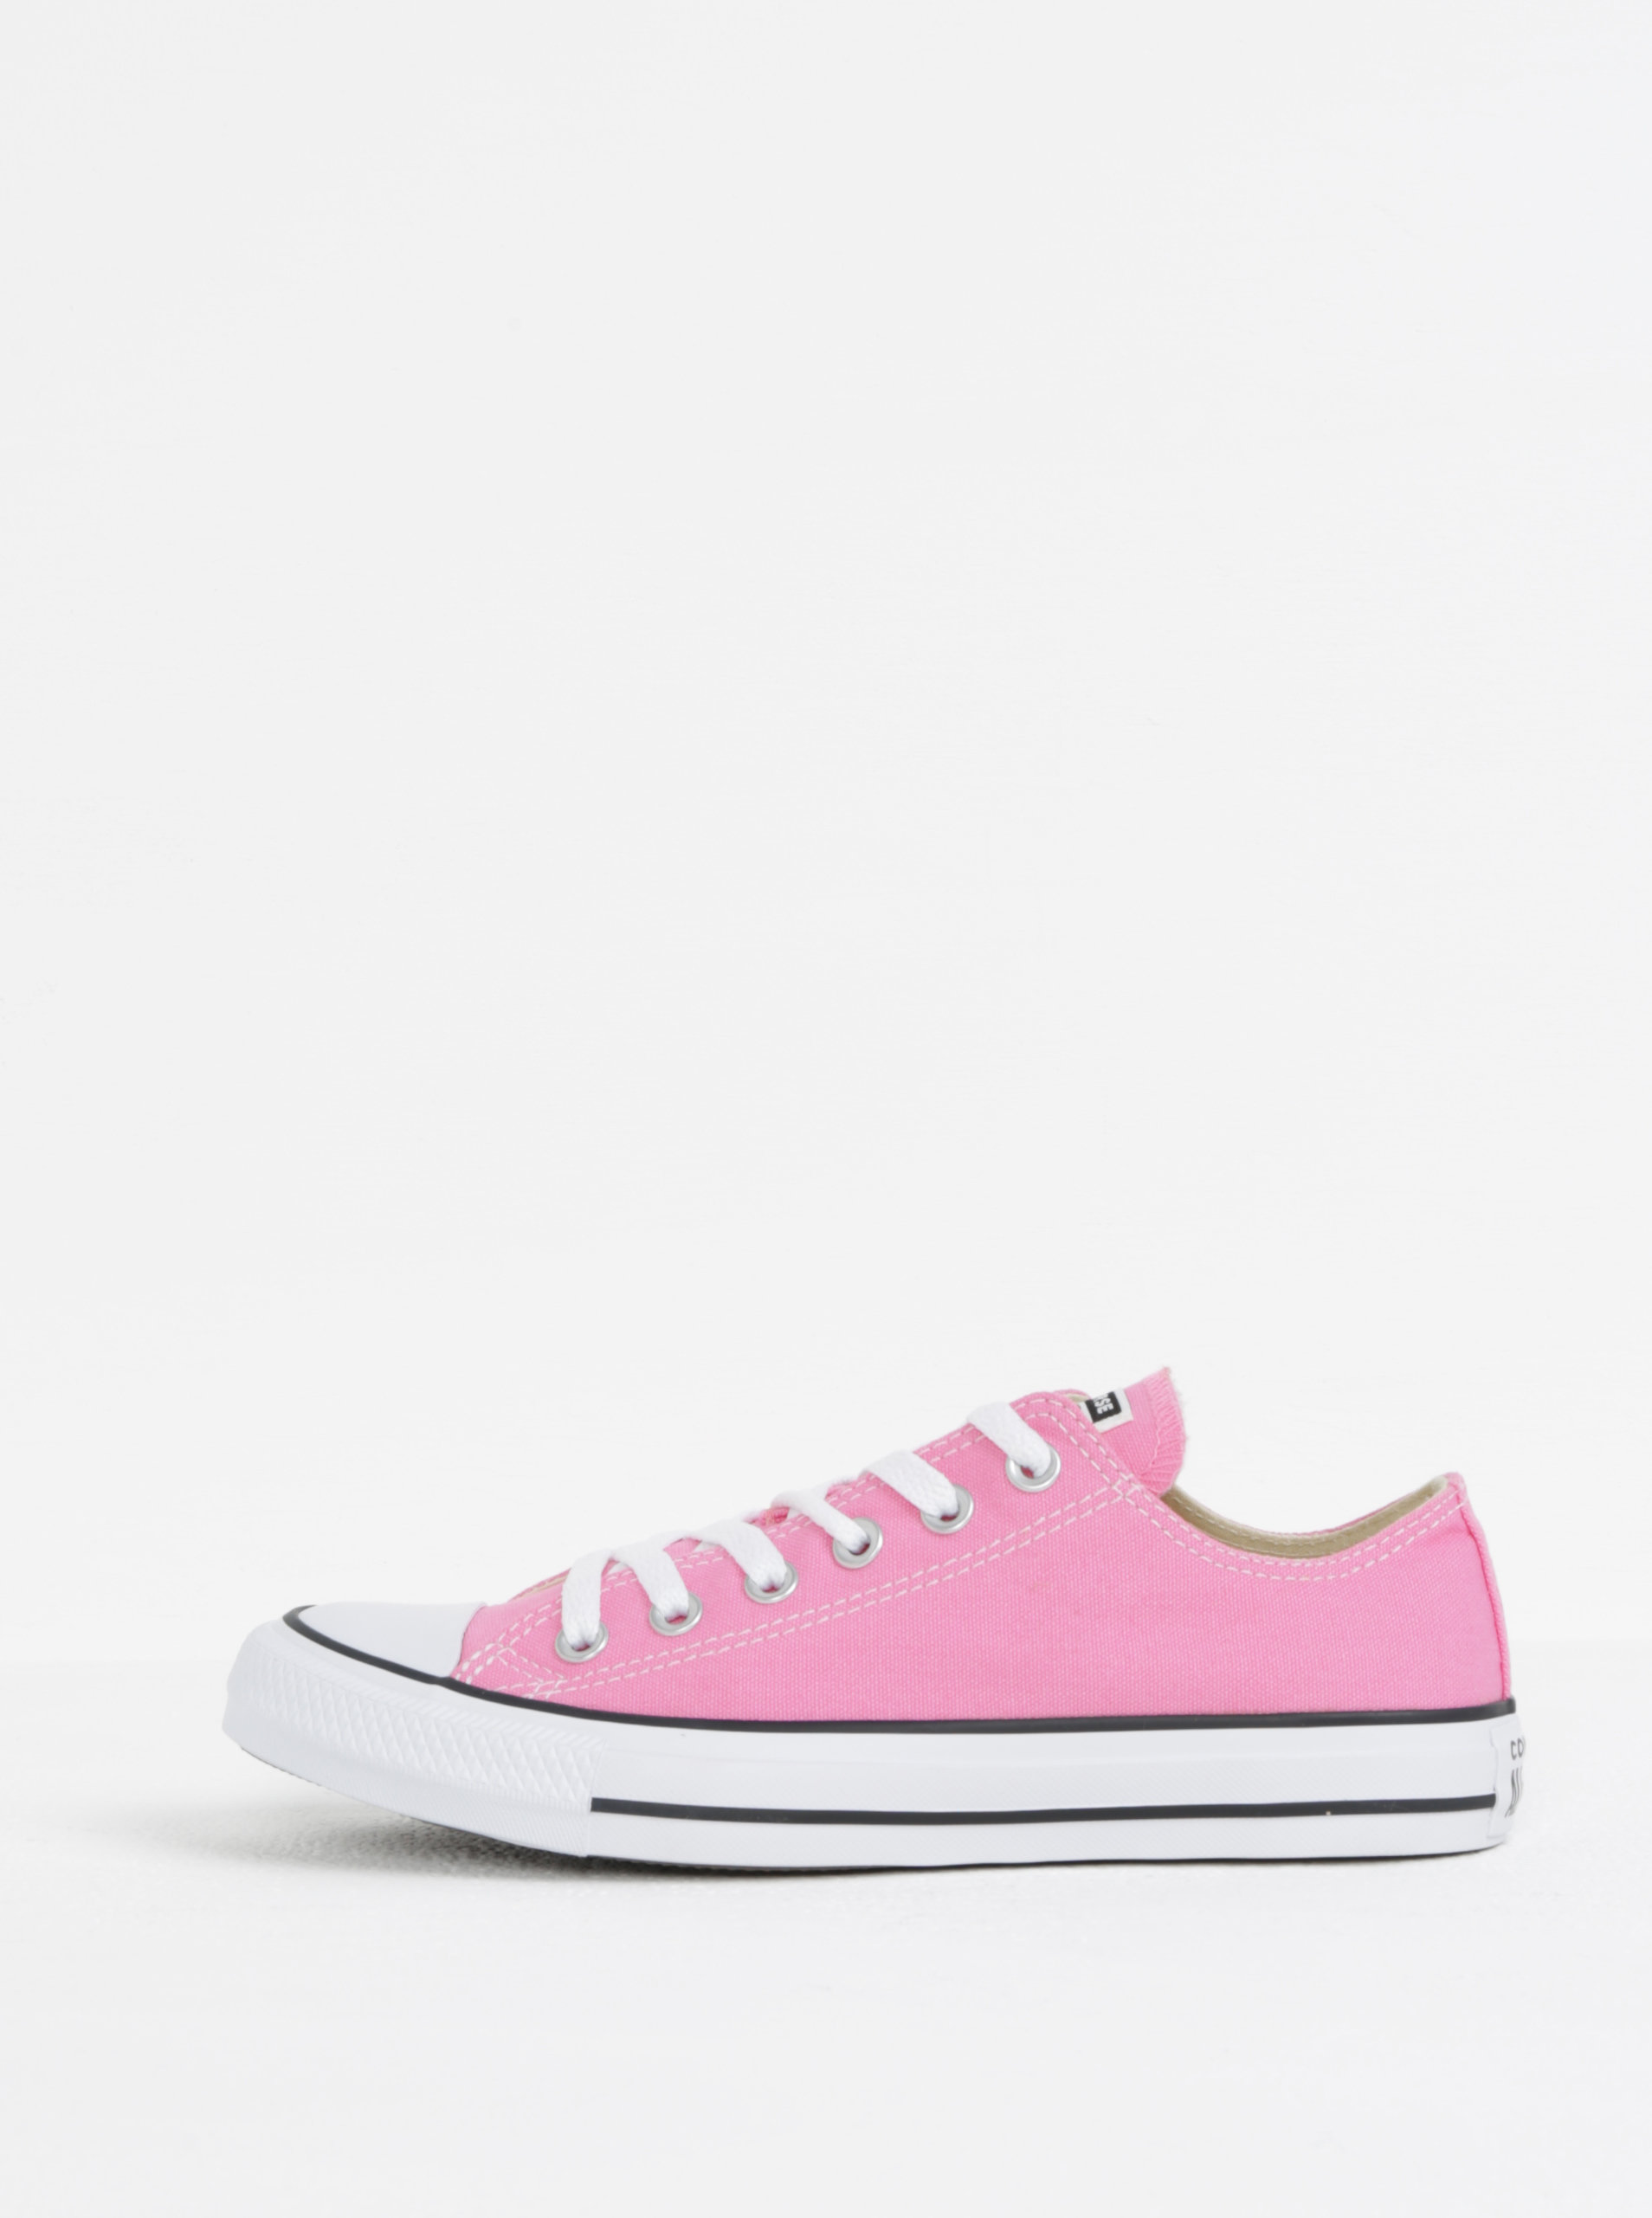 81affa022d0ad Ružové dámske tenisky Converse Chuck Taylor All Star | ZOOT.sk